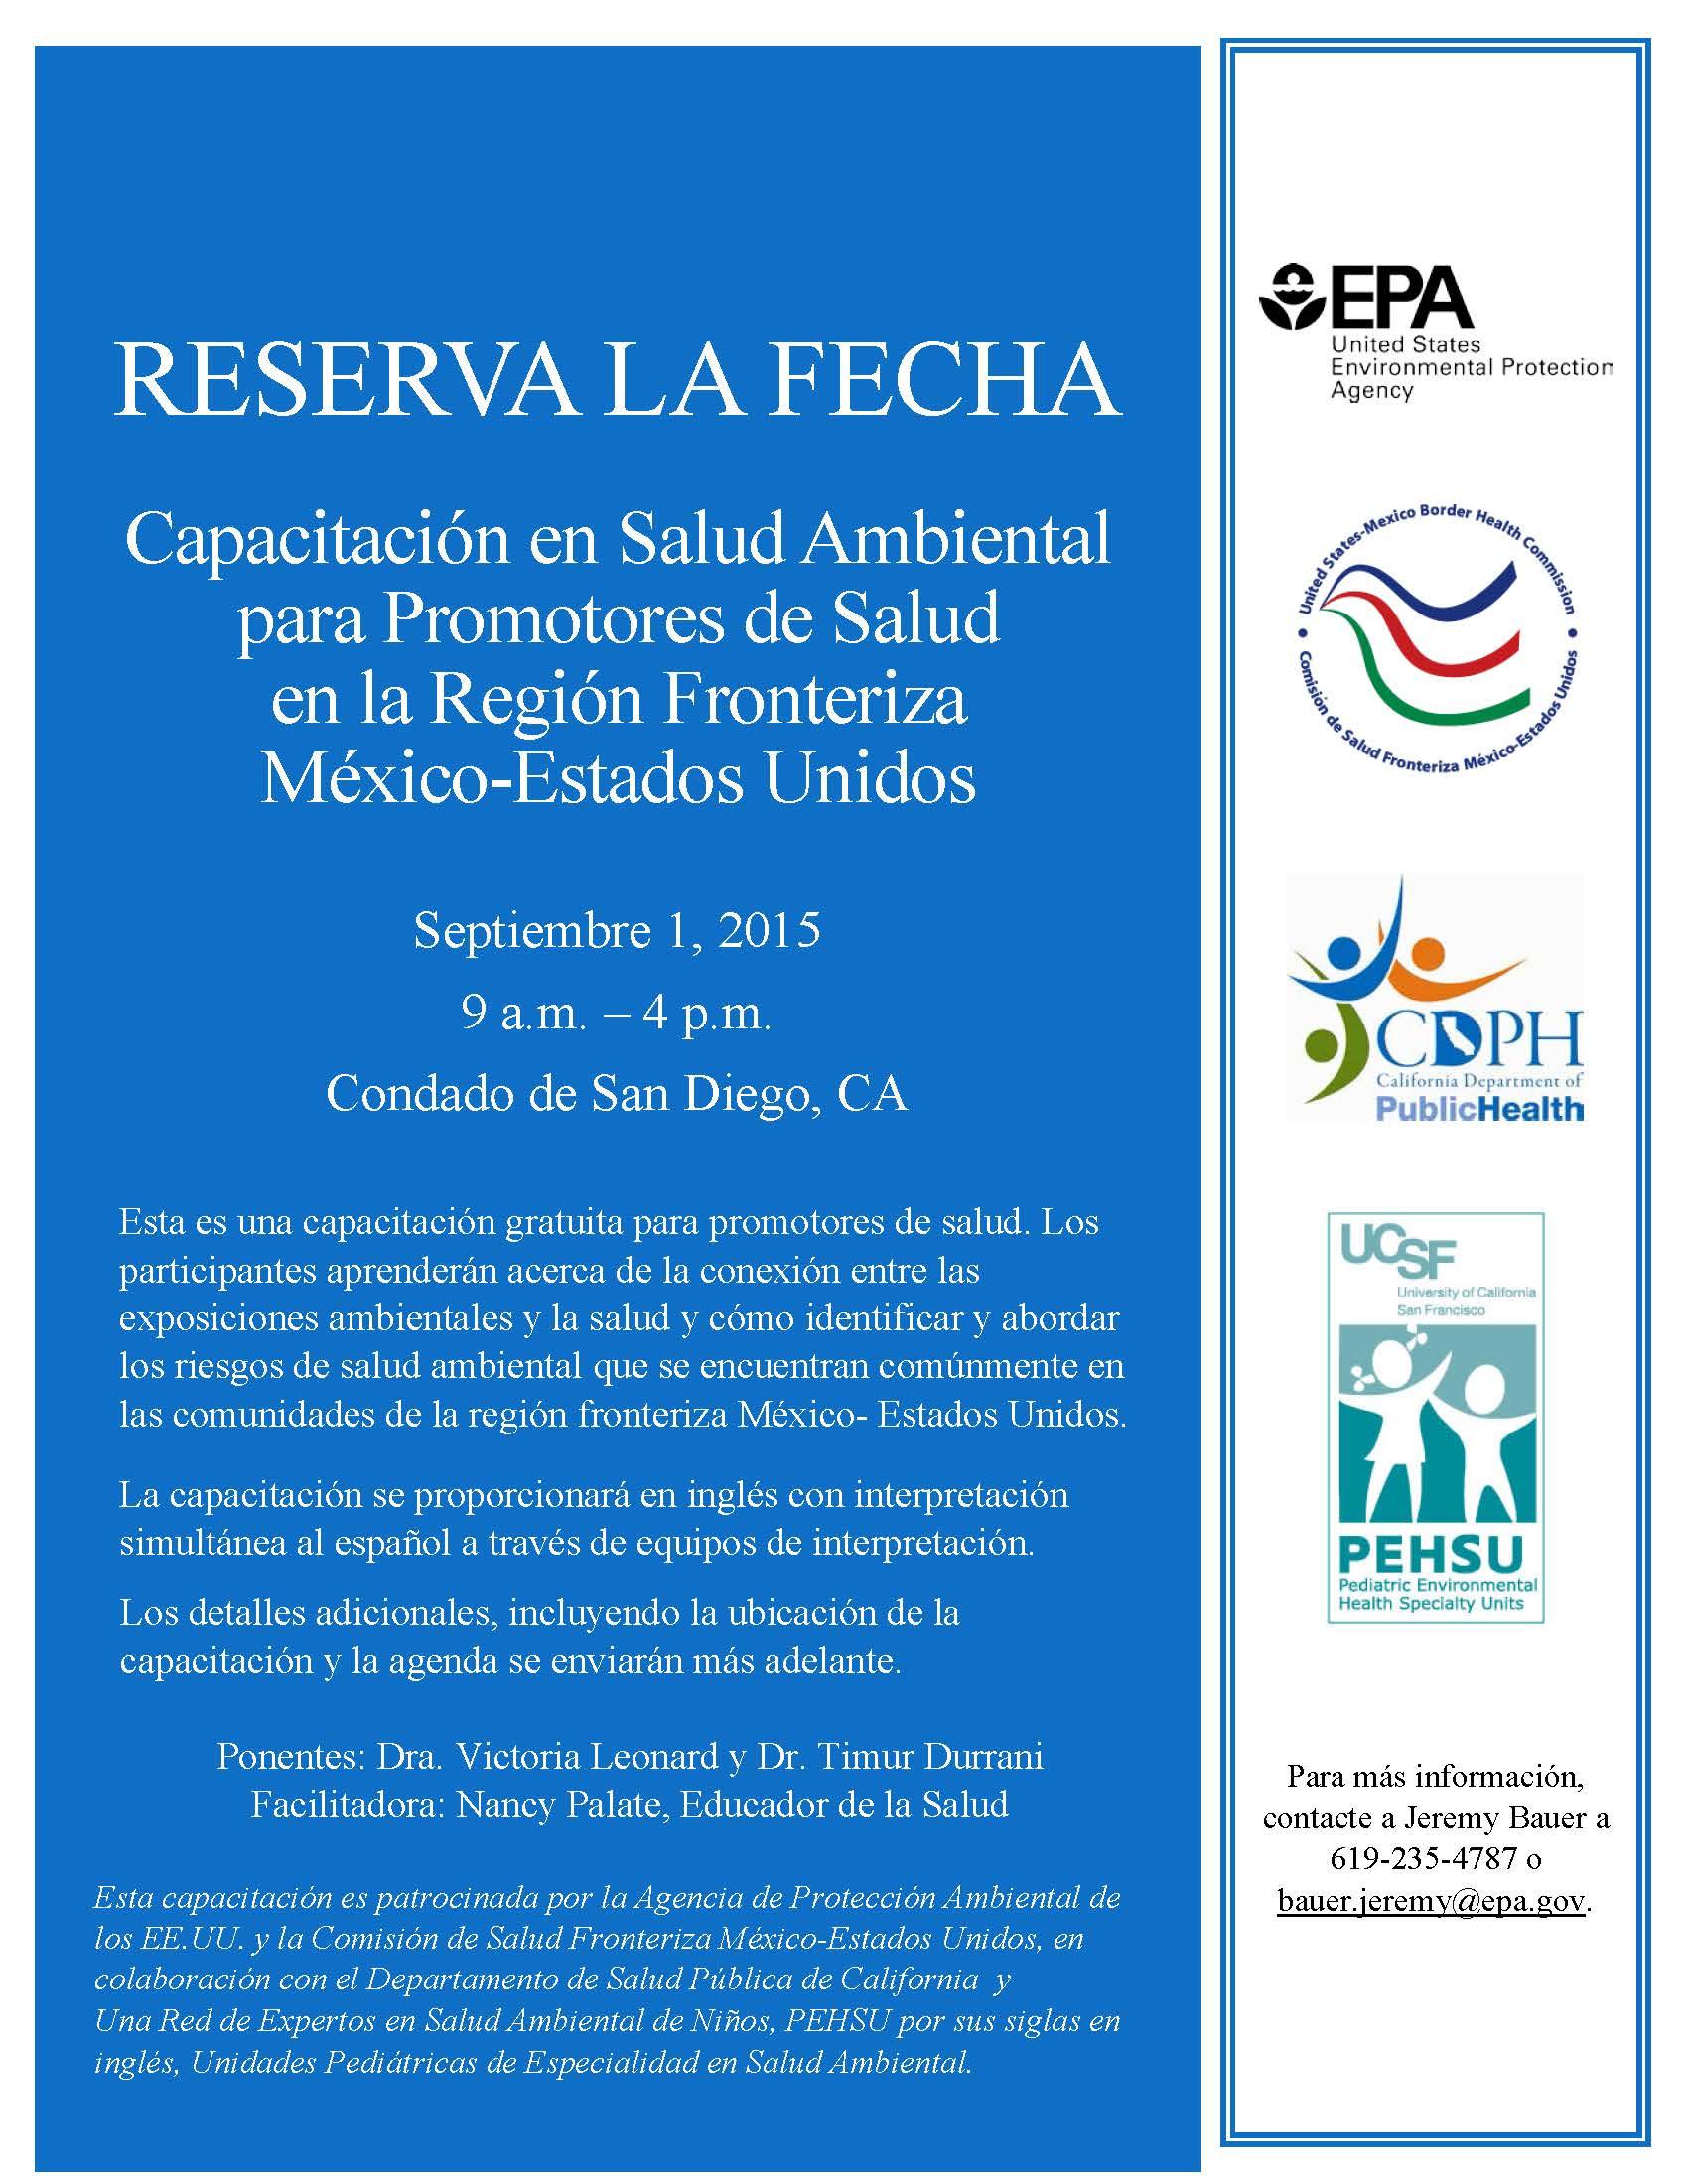 STD_EPA Promotores Training_Spn_San Diego_071715 FINAL_Page_1